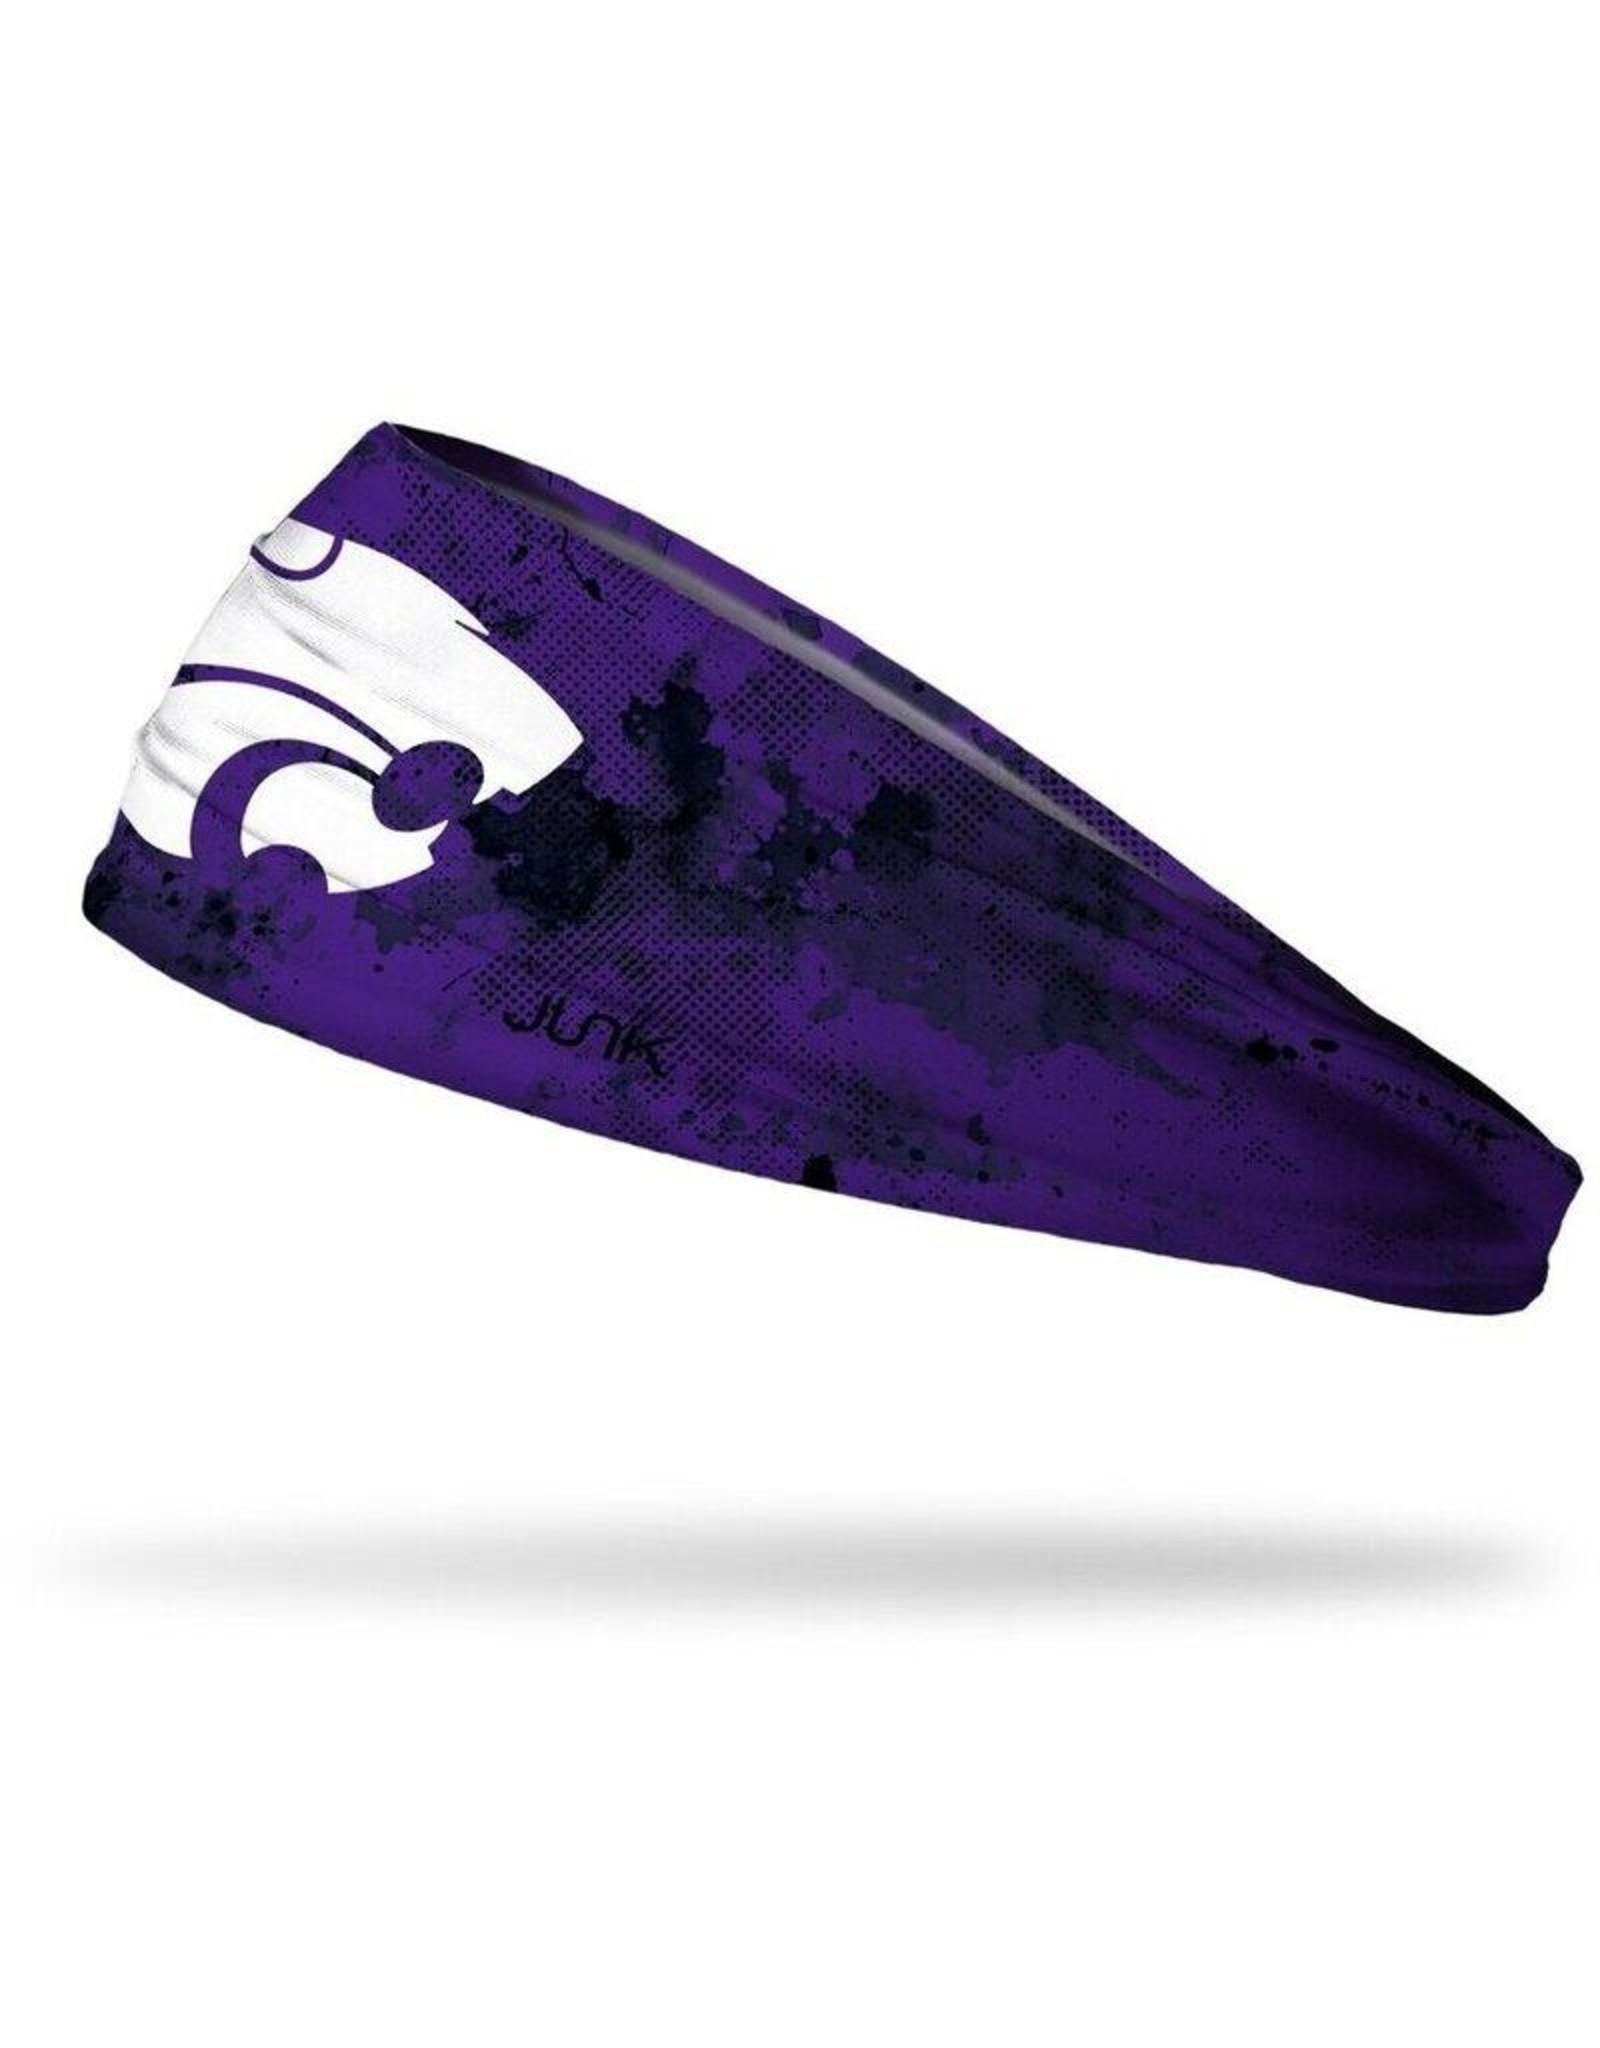 Junk KSU Grunge Purple Headband